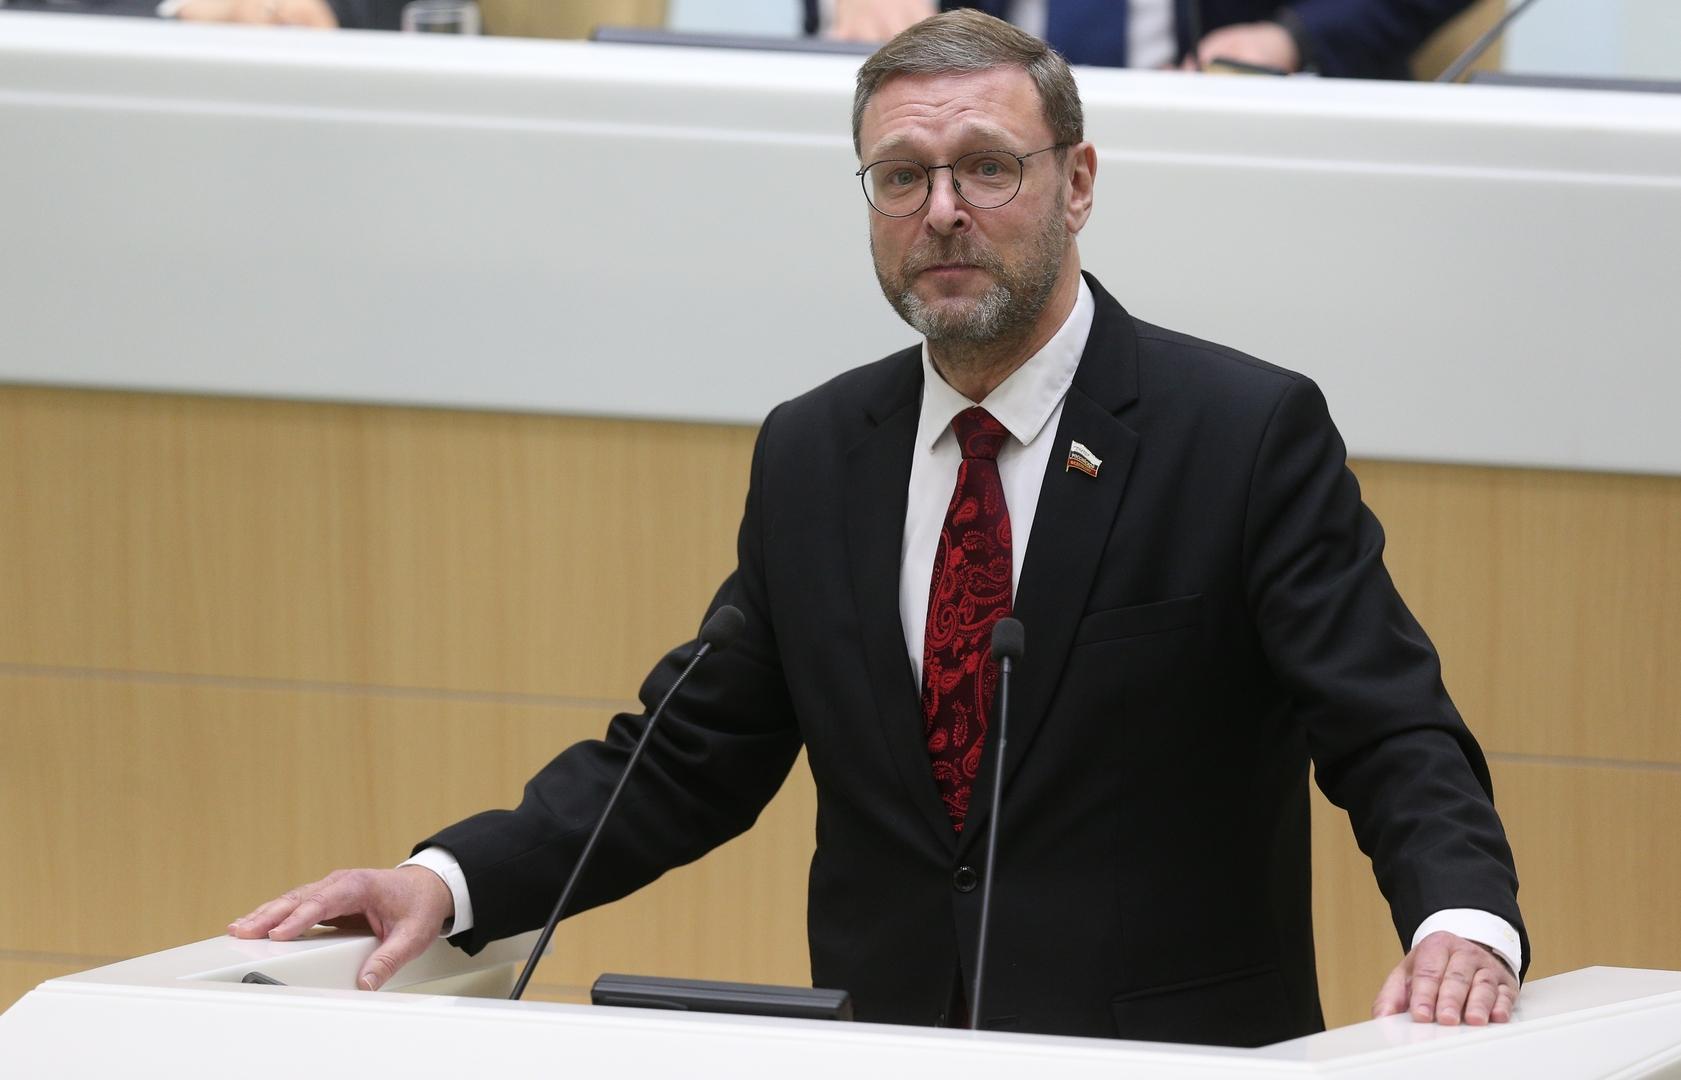 نائب رئيس مجلس الاتحاد الروسي قسطنطين كوساتشوف